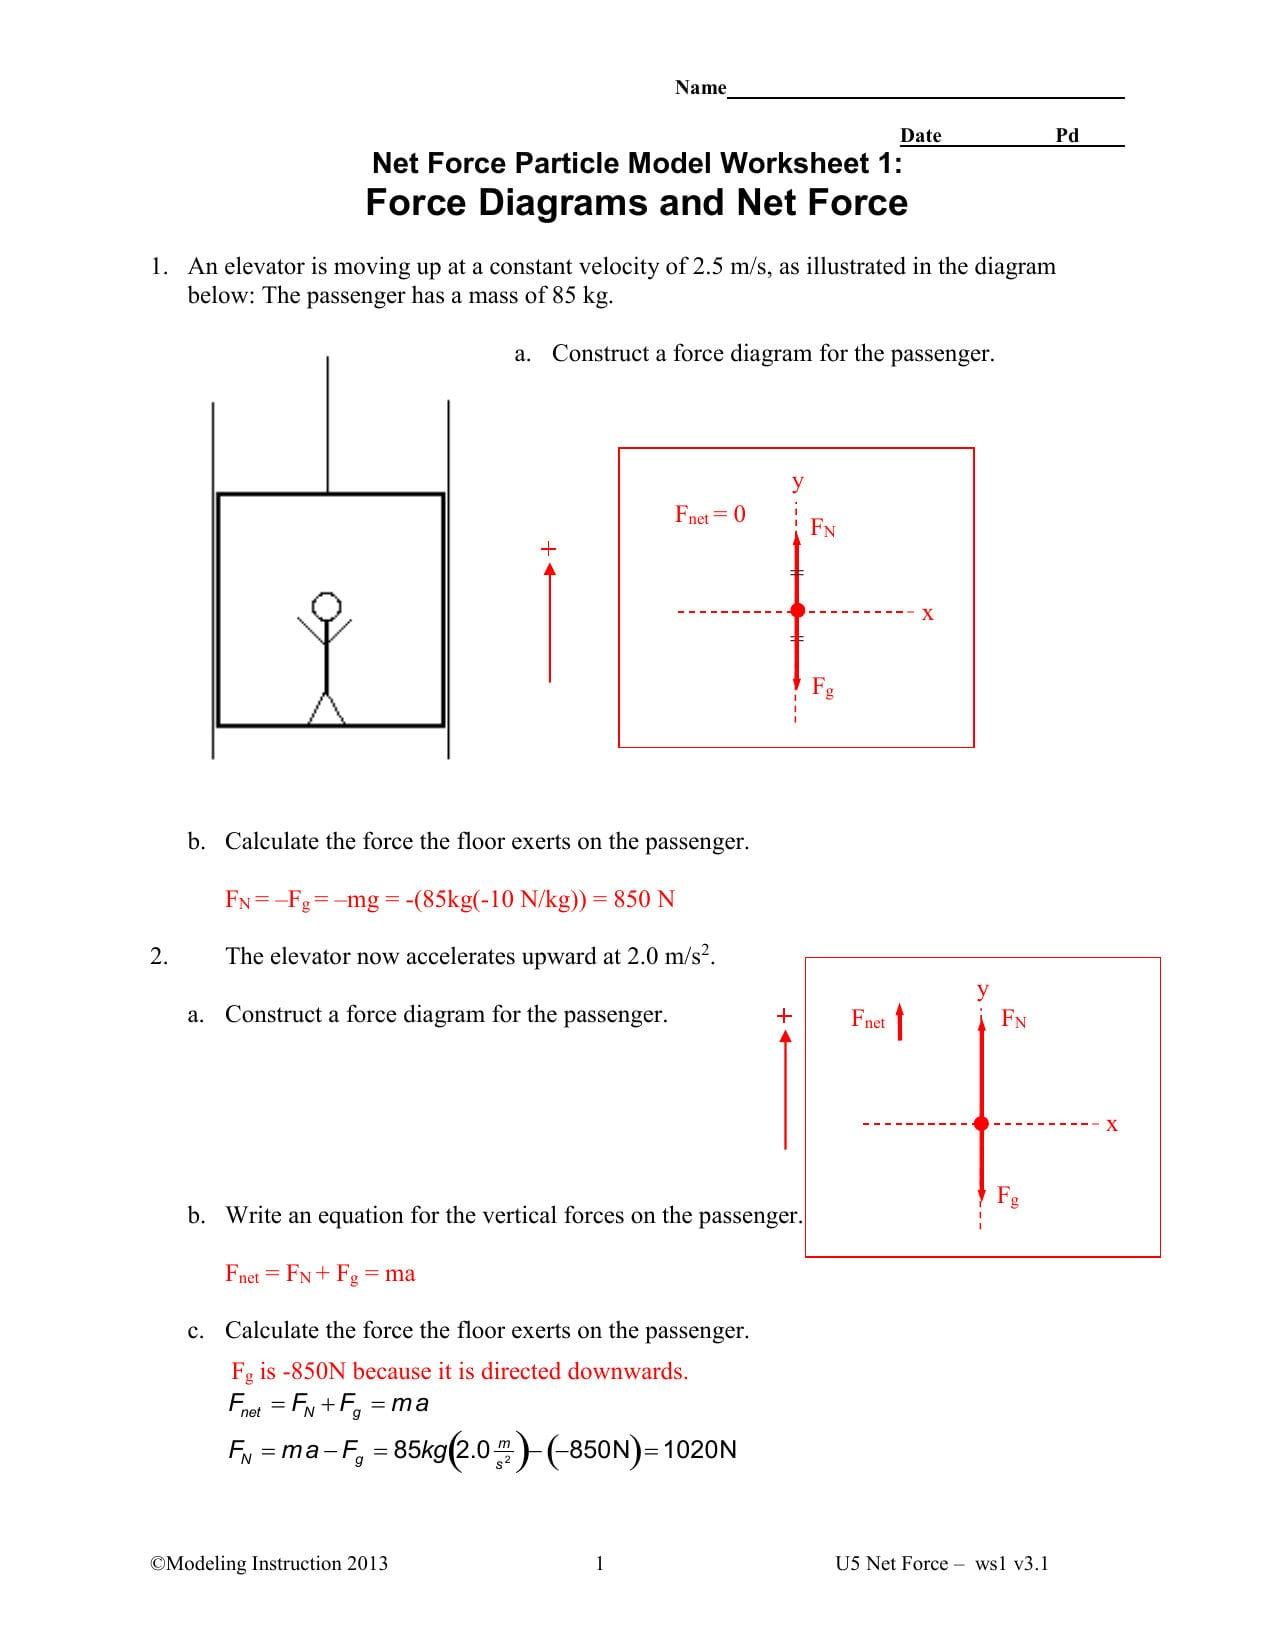 Net Force Worksheet